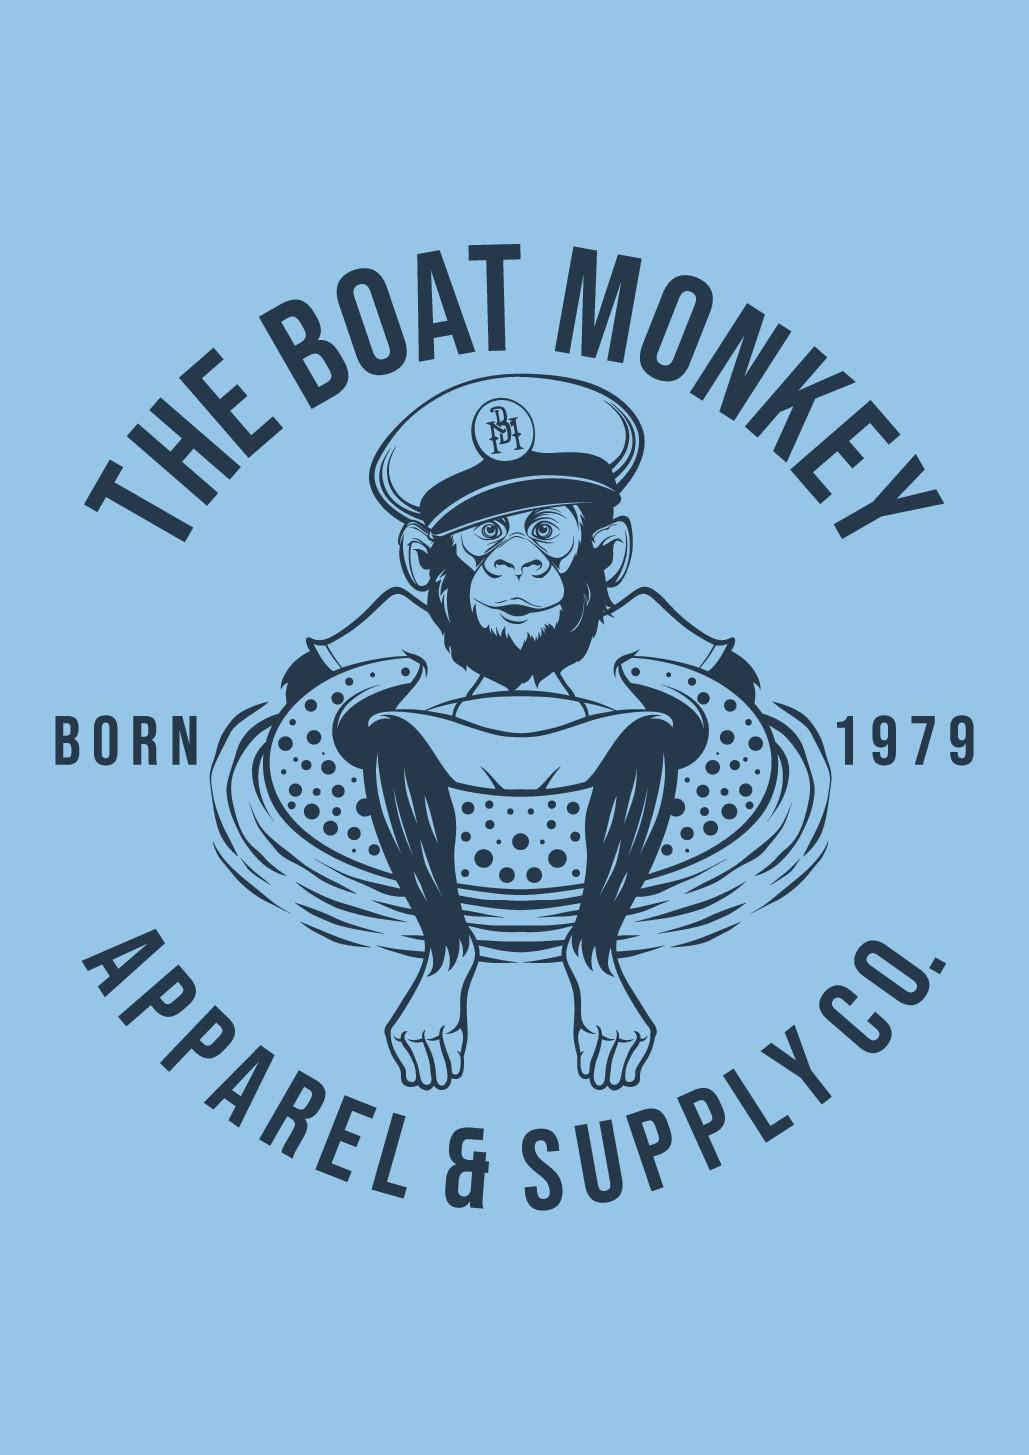 The Boat Monkey T-Shirt